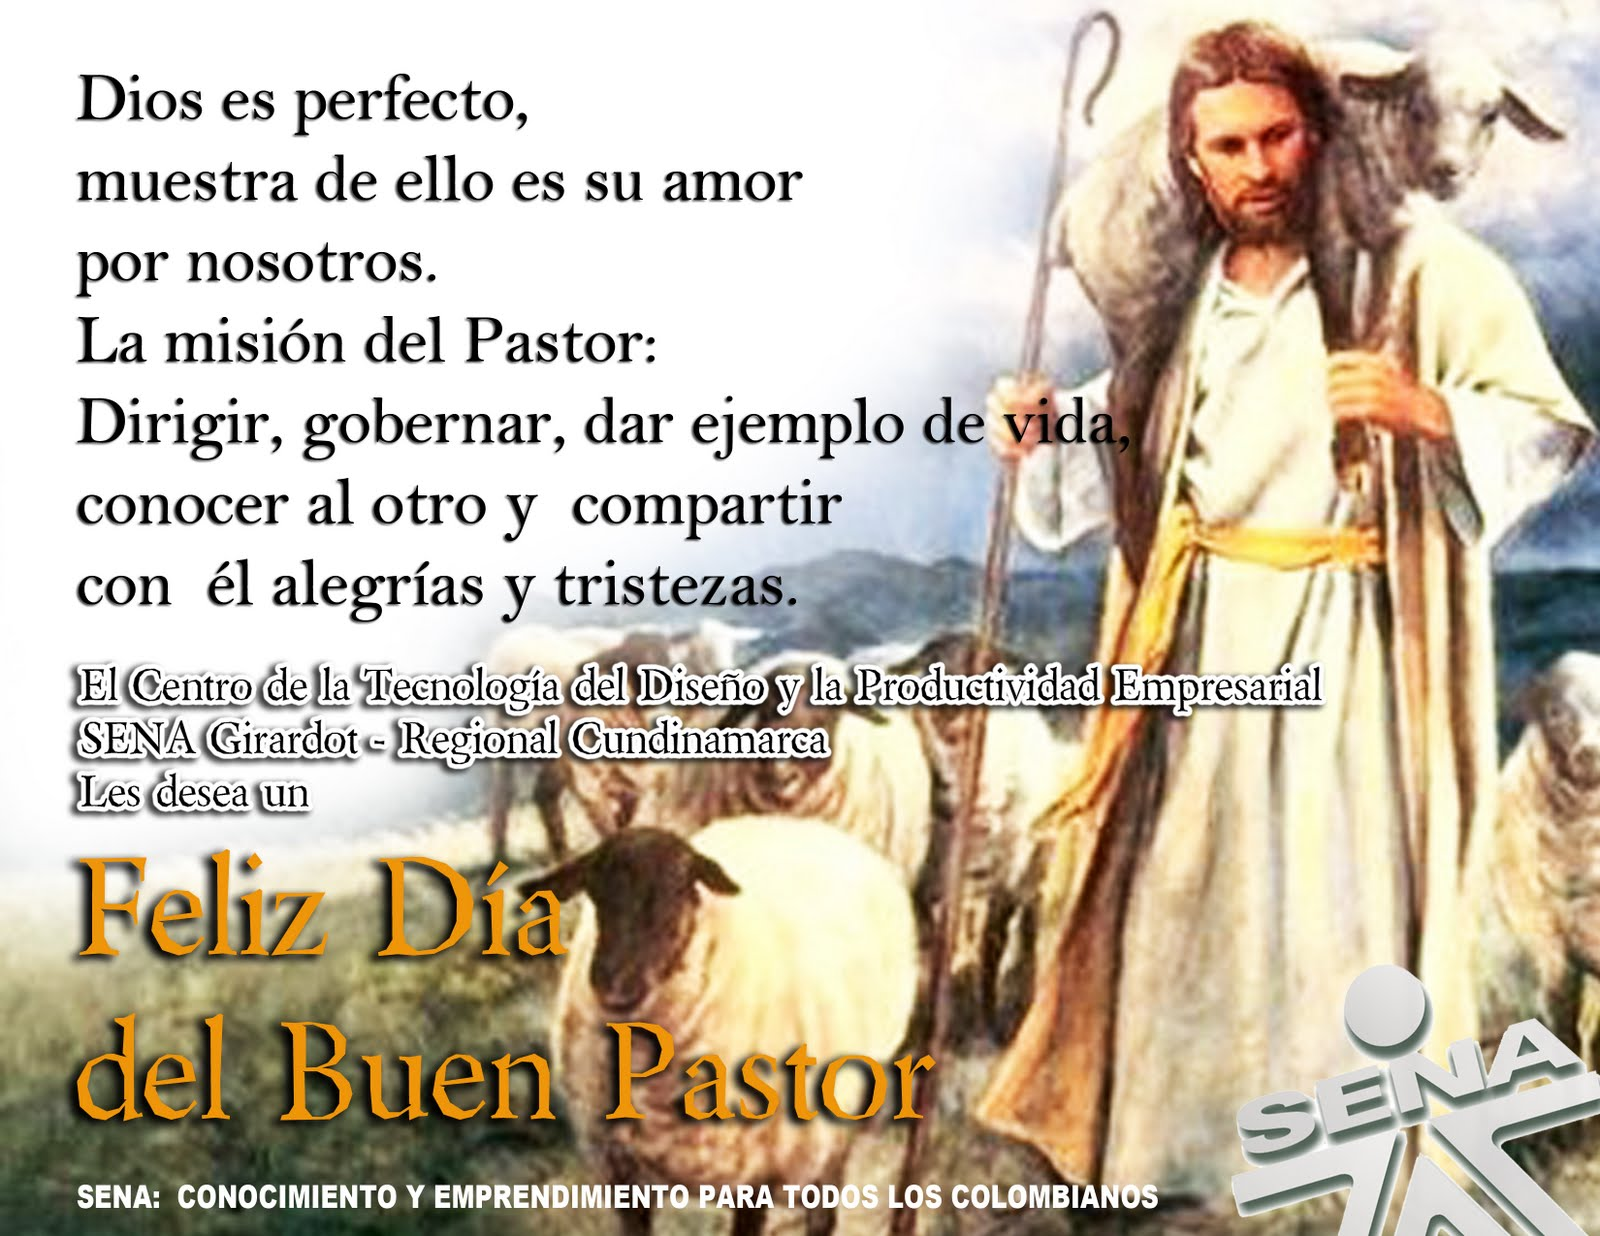 Feliz DIA Del Pastor